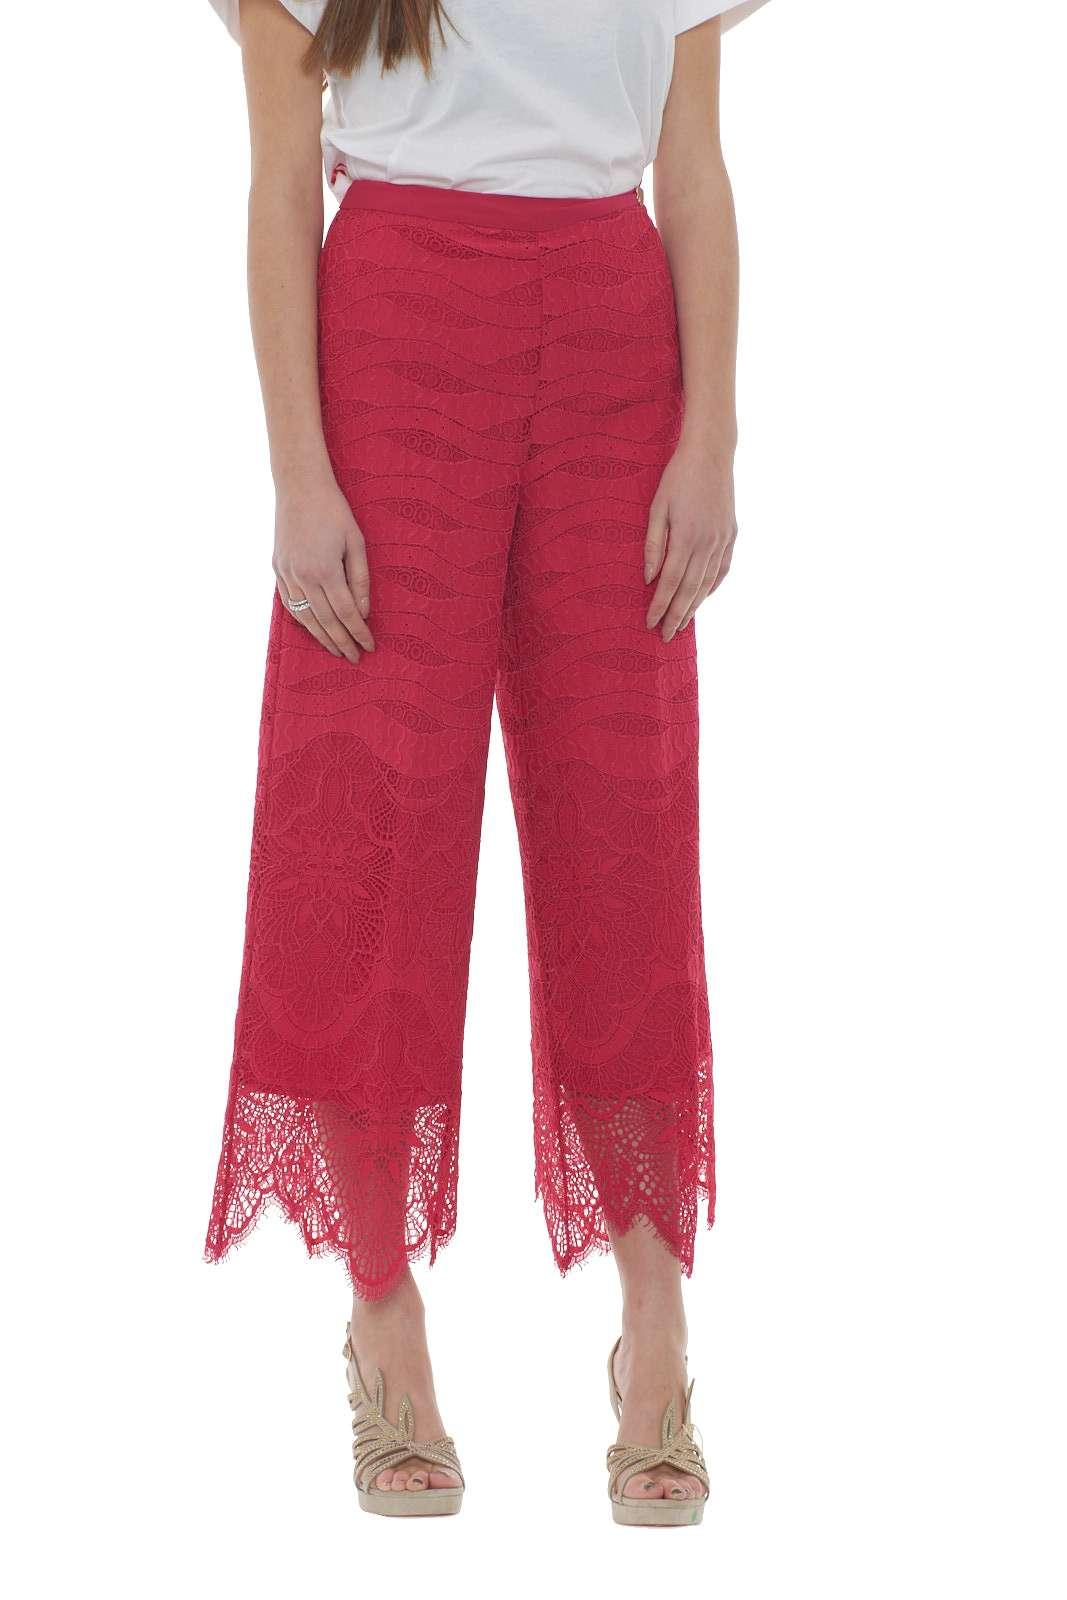 https://www.parmax.com/media/catalog/product/a/i/PE-outlet_parmax-pantaloni-donna-TwinSet-201TP2033-A.jpg